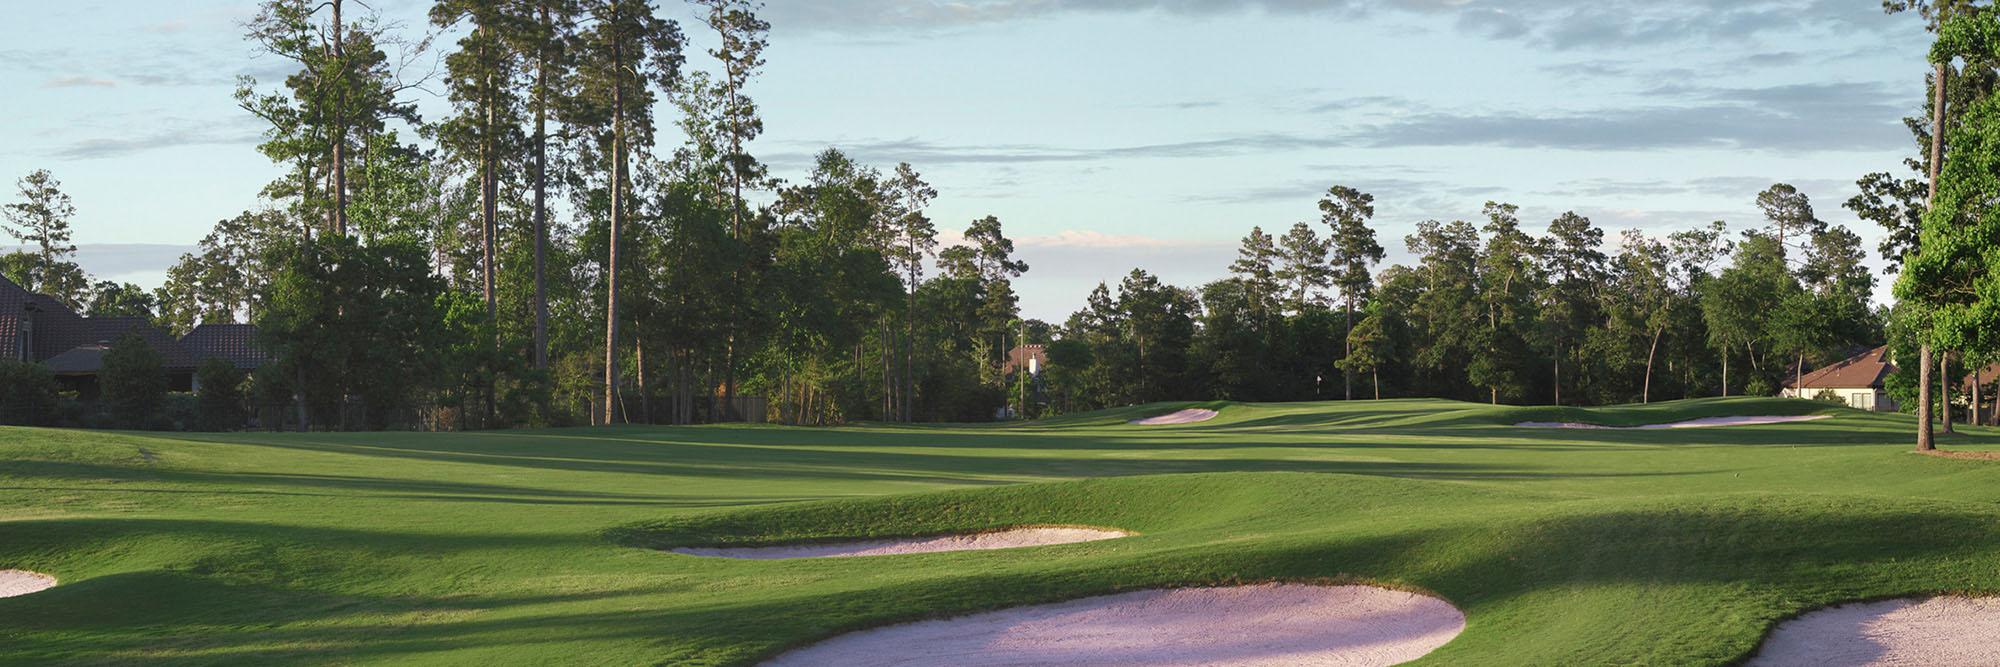 Golf Course Image - Woodlands-Player Course No. 2